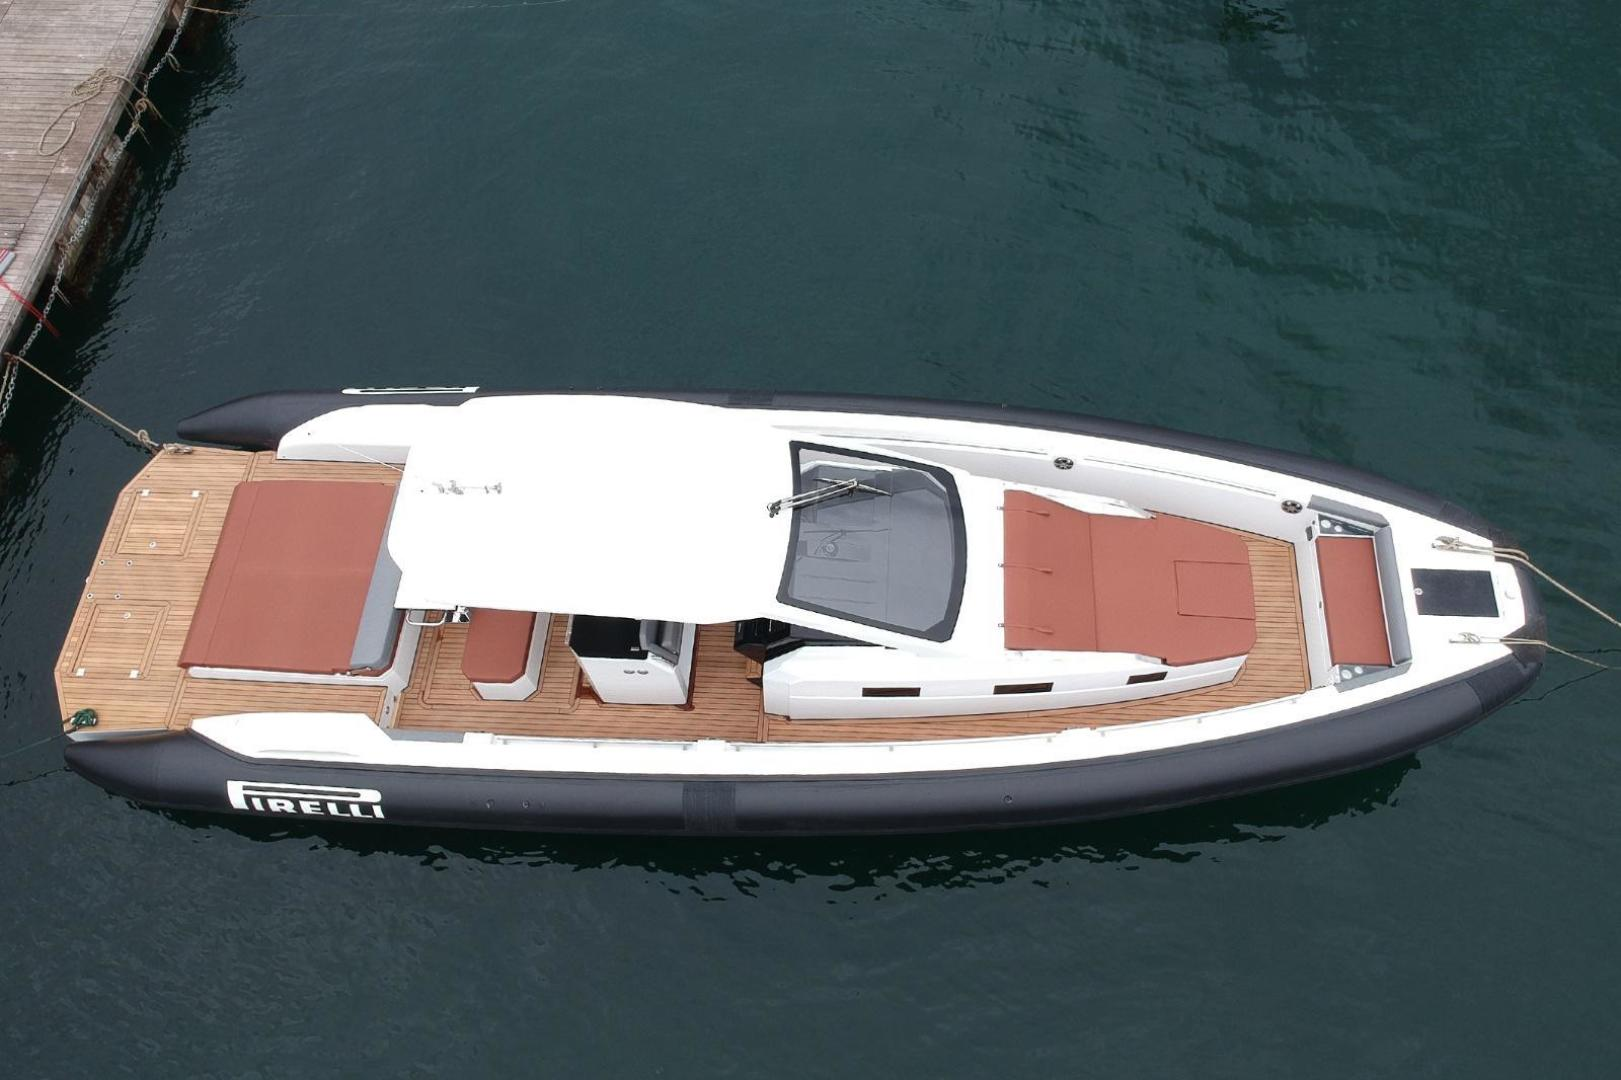 Pirelli-PZero 1250 2020-Pzero 1250 Fort Lauderdale-Florida-United States-1549623   Thumbnail